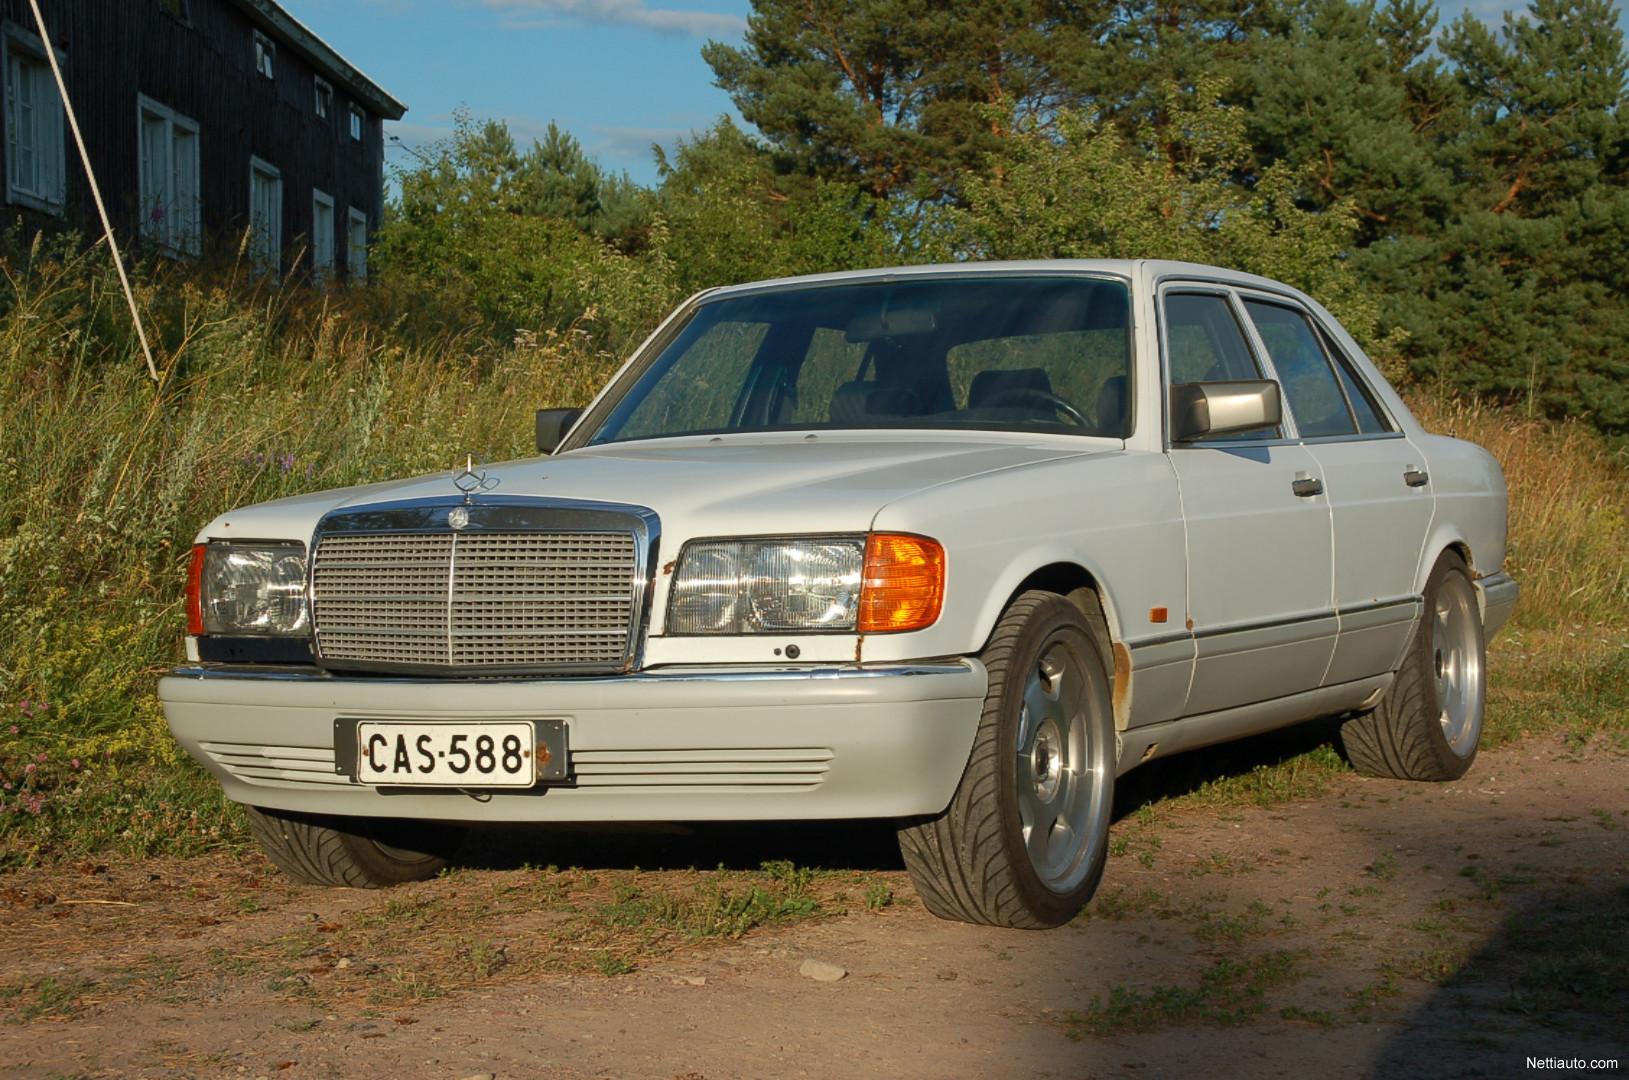 Mercedes benz se 260 se sedan 1990 used vehicle nettiauto for Mercedes benz 260